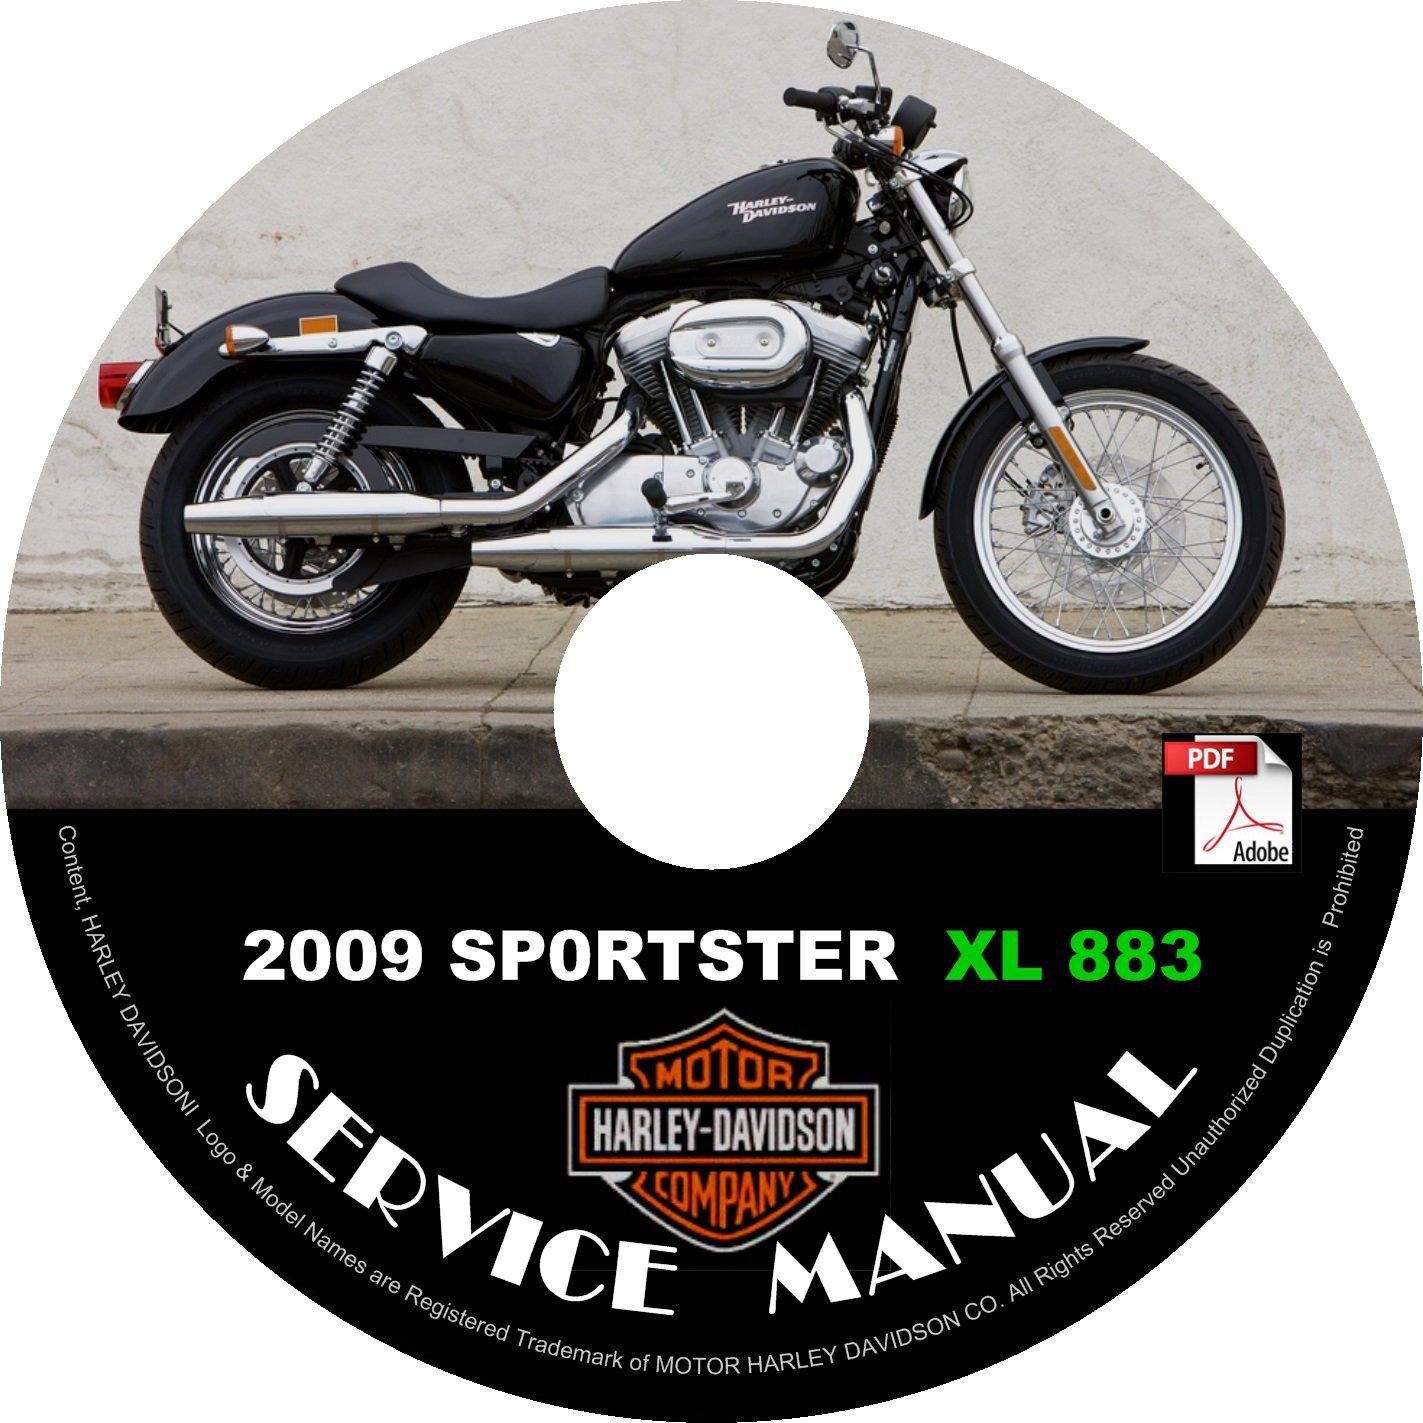 2009 Harley Davidson SPORTSTER XL 883 Service Repair Shop Manual on CD FiX Rebuild '09 Workshop